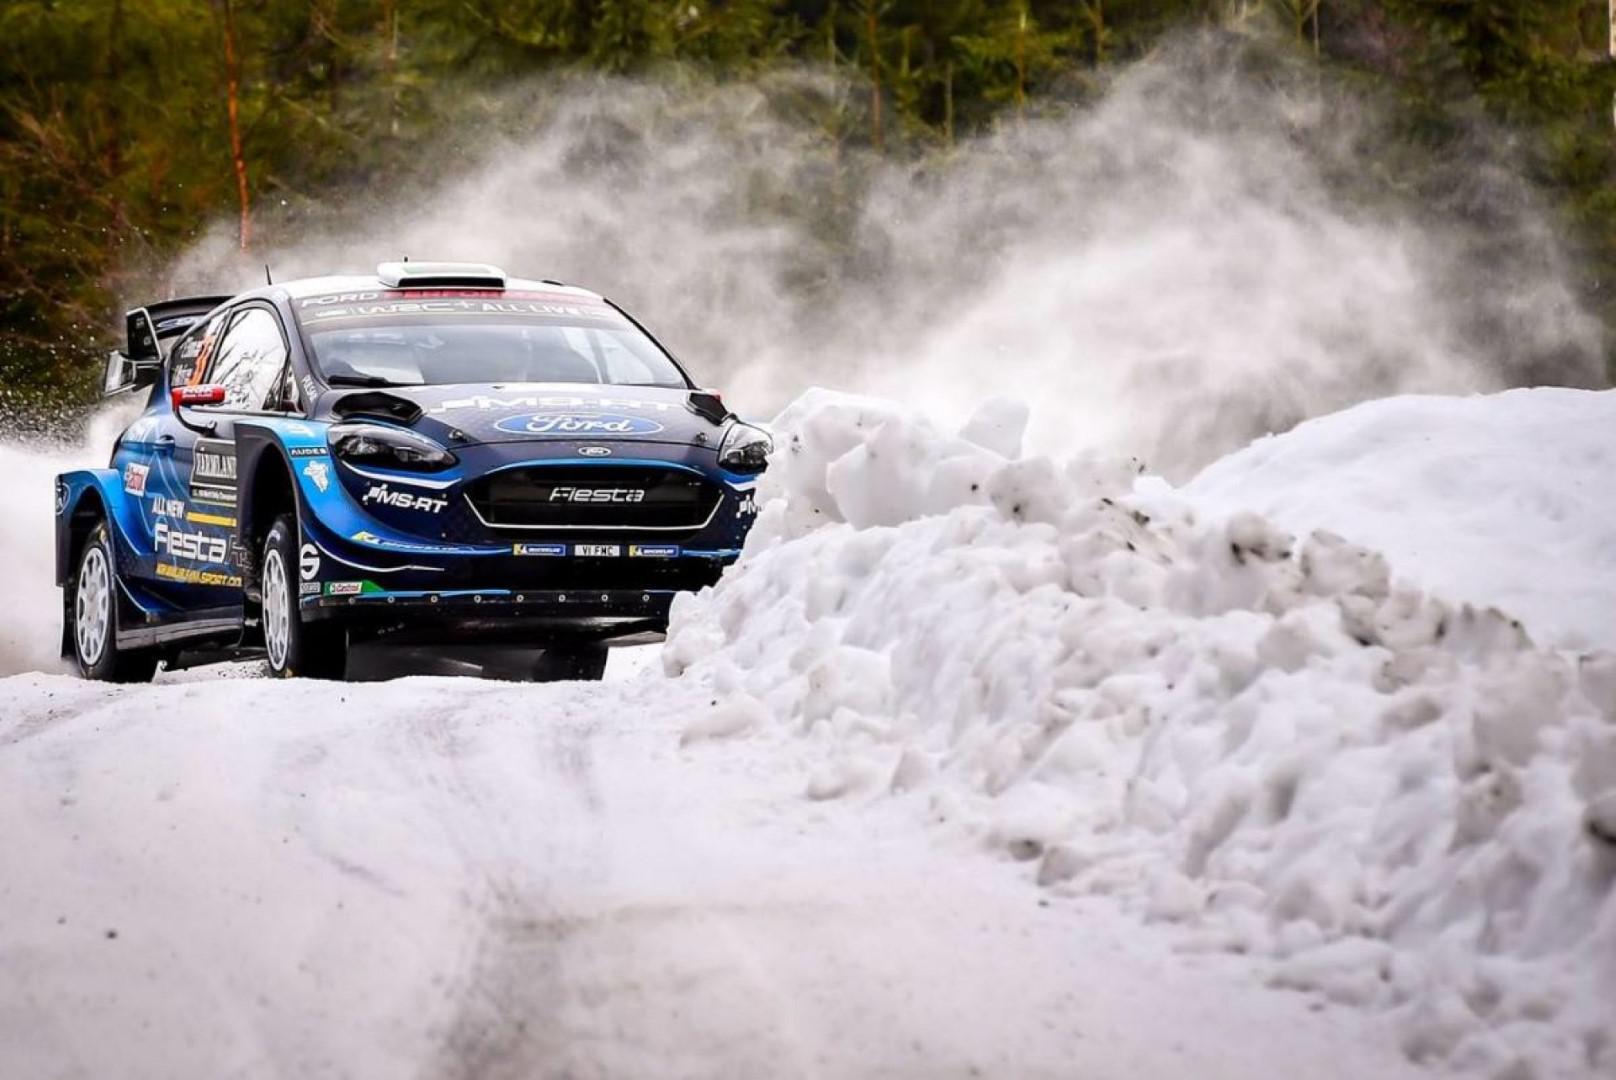 Rallye de suède 2019 : Teemu Suninen prend les commandes du rallye.